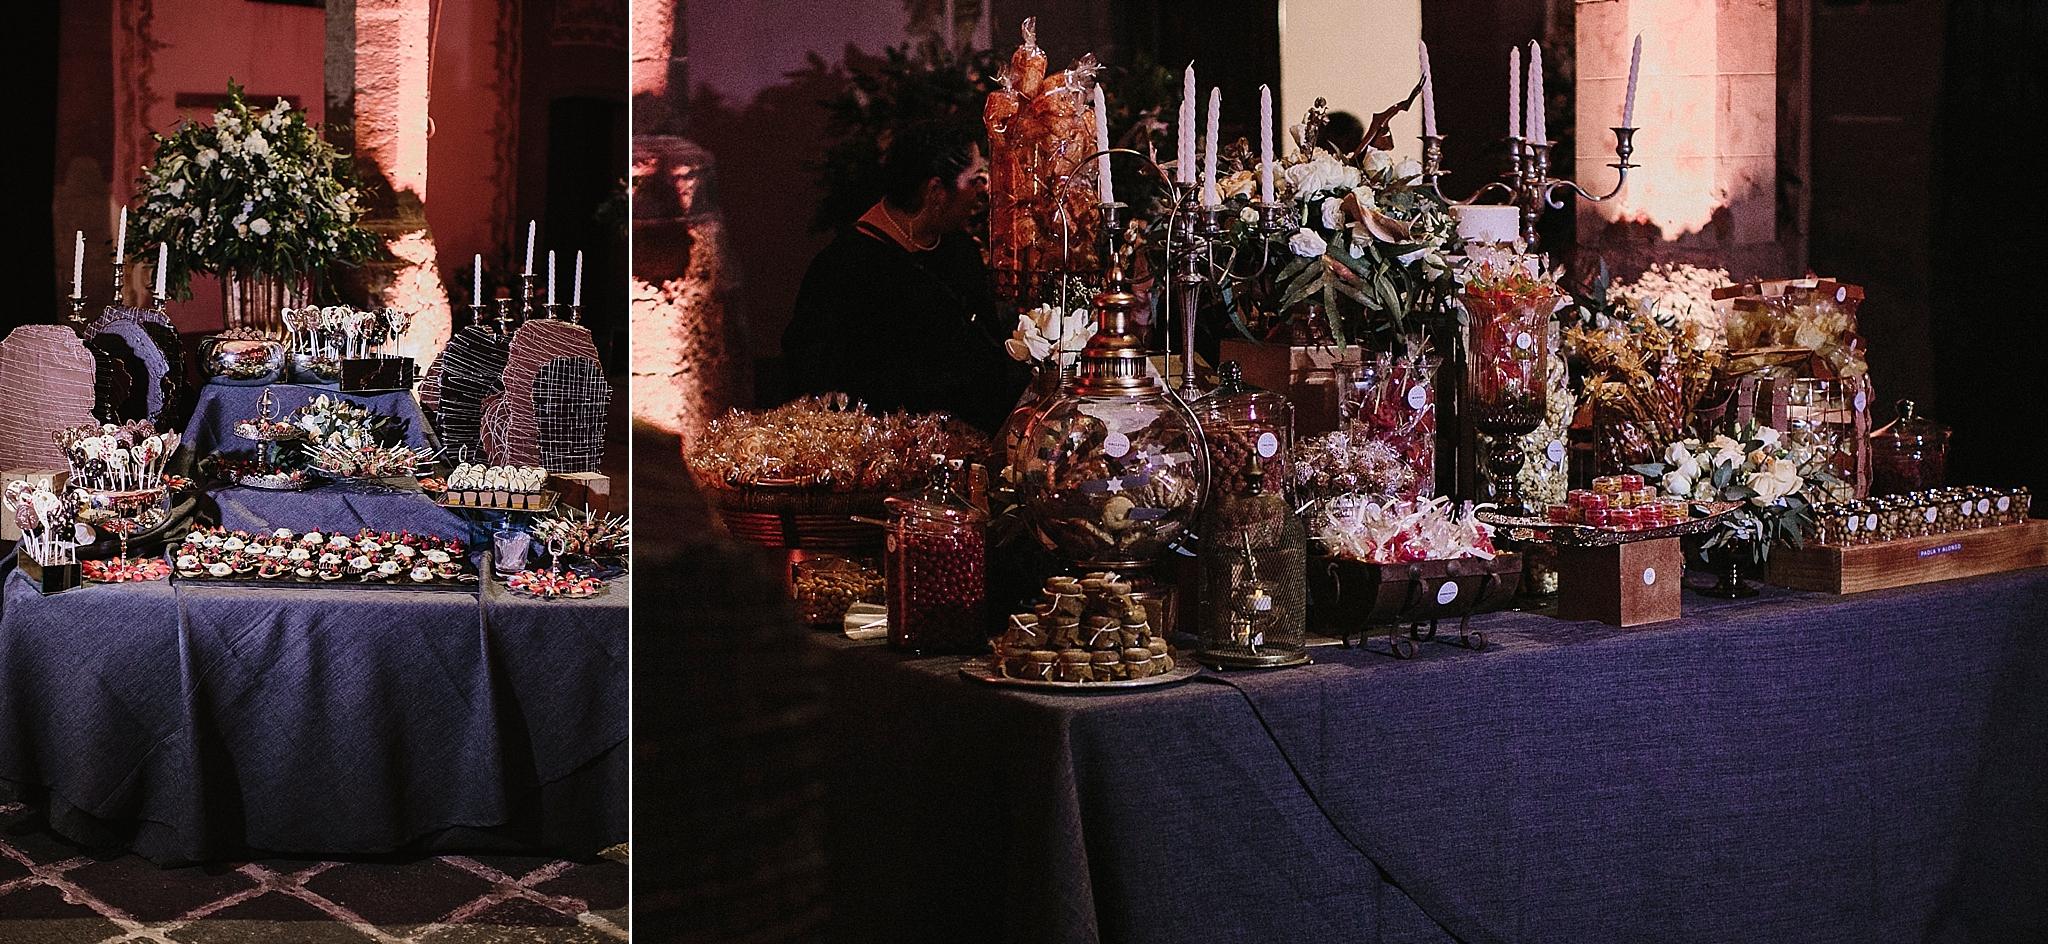 alfonso_flores_destination_wedding_photogrpahy_paola_alonso-895-1.jpg